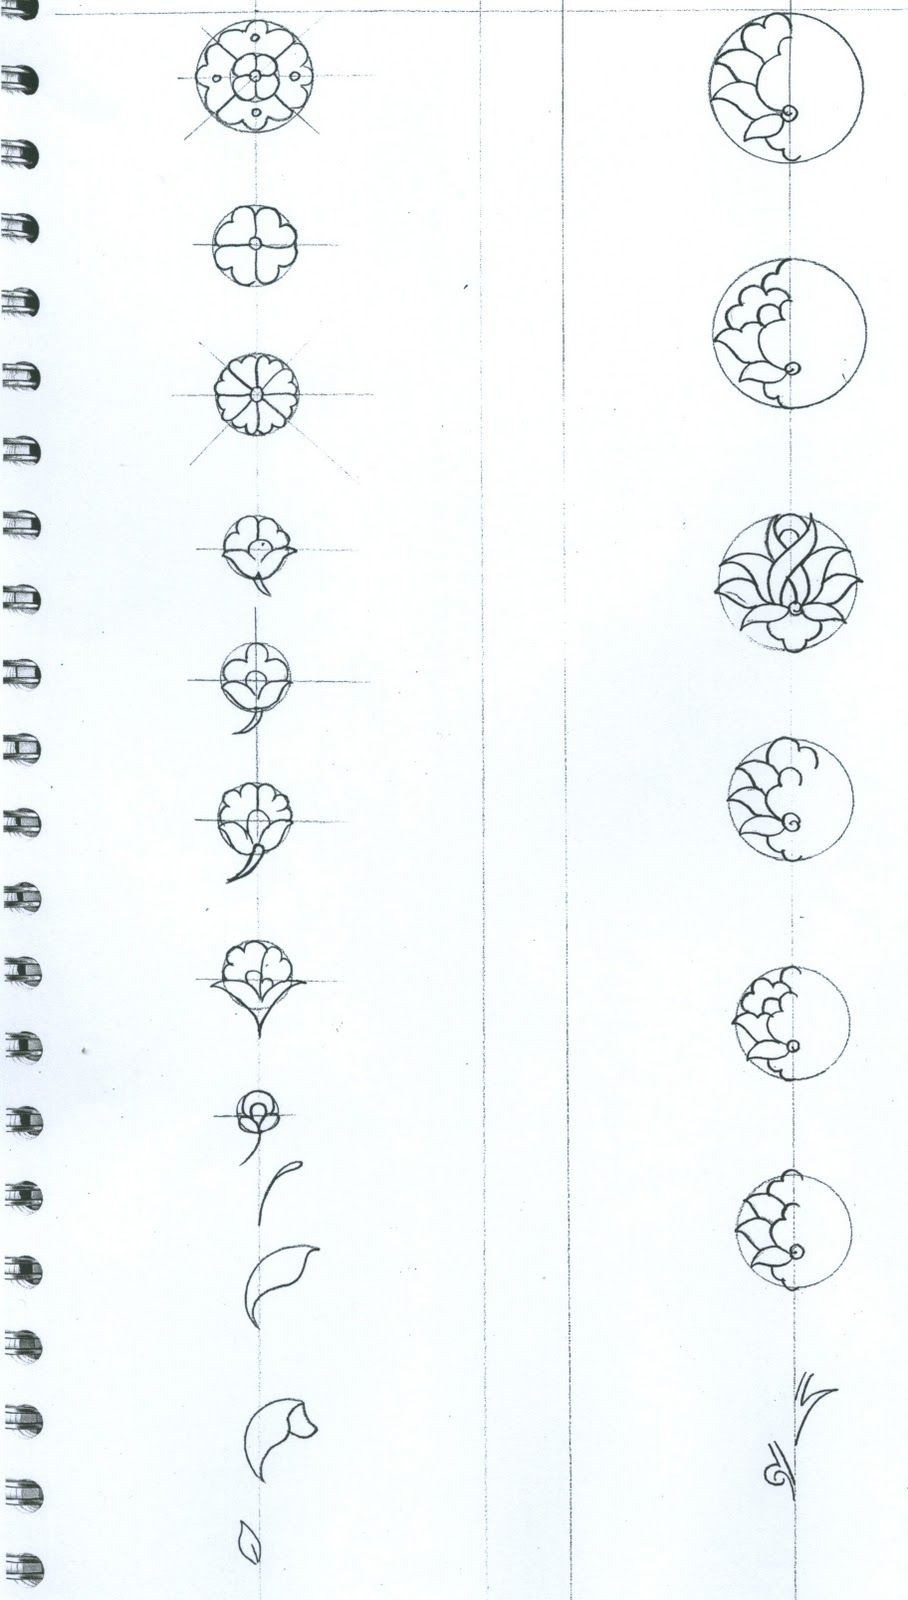 Islamic Patterns by Hadil Tamim